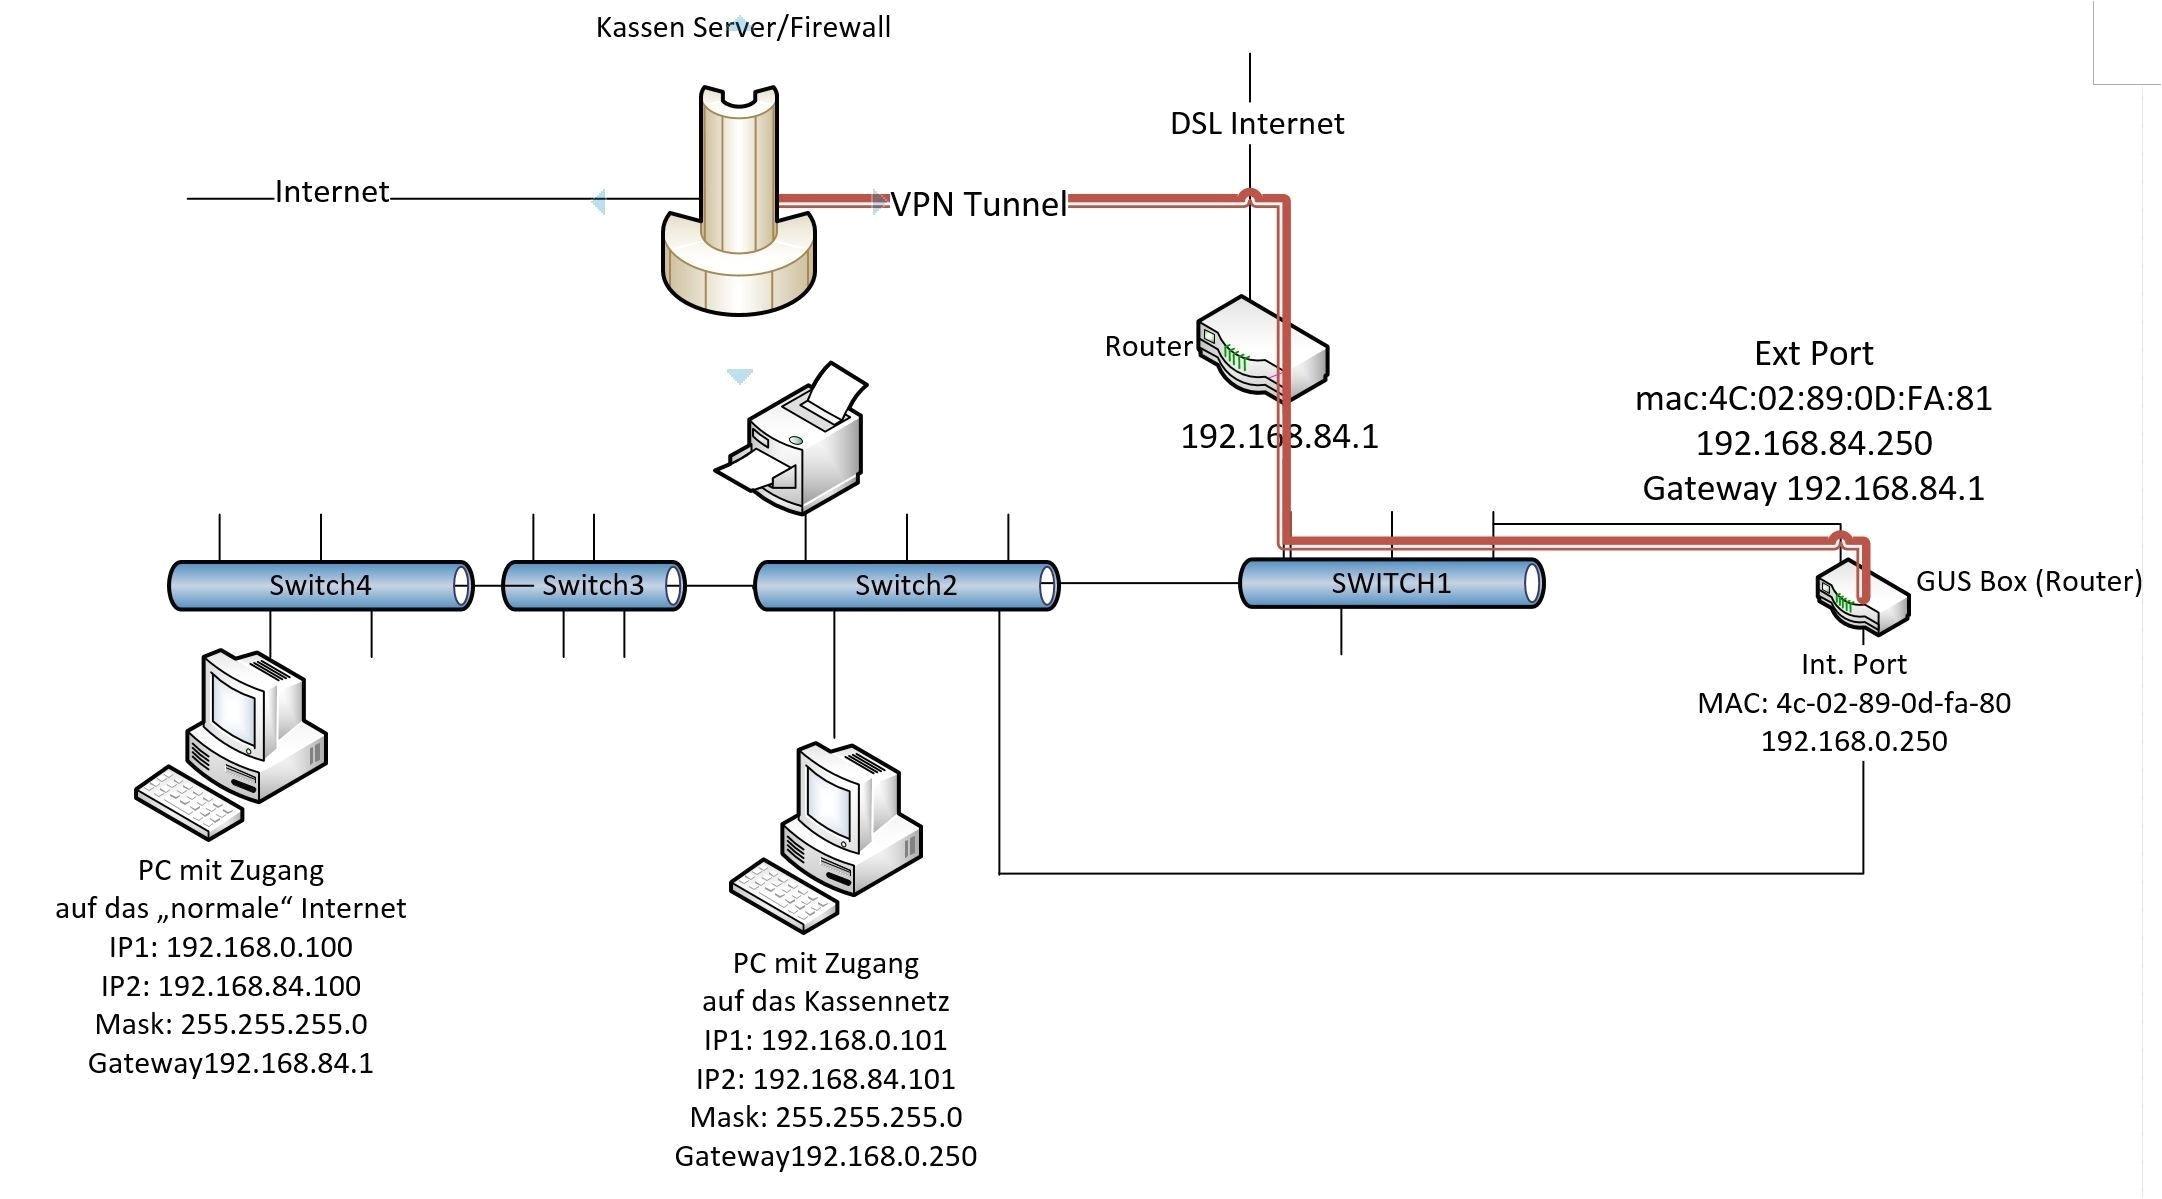 light fixture wiring diagram fresh wiring diagrams light fixtures uk best wiring diagram uk new best